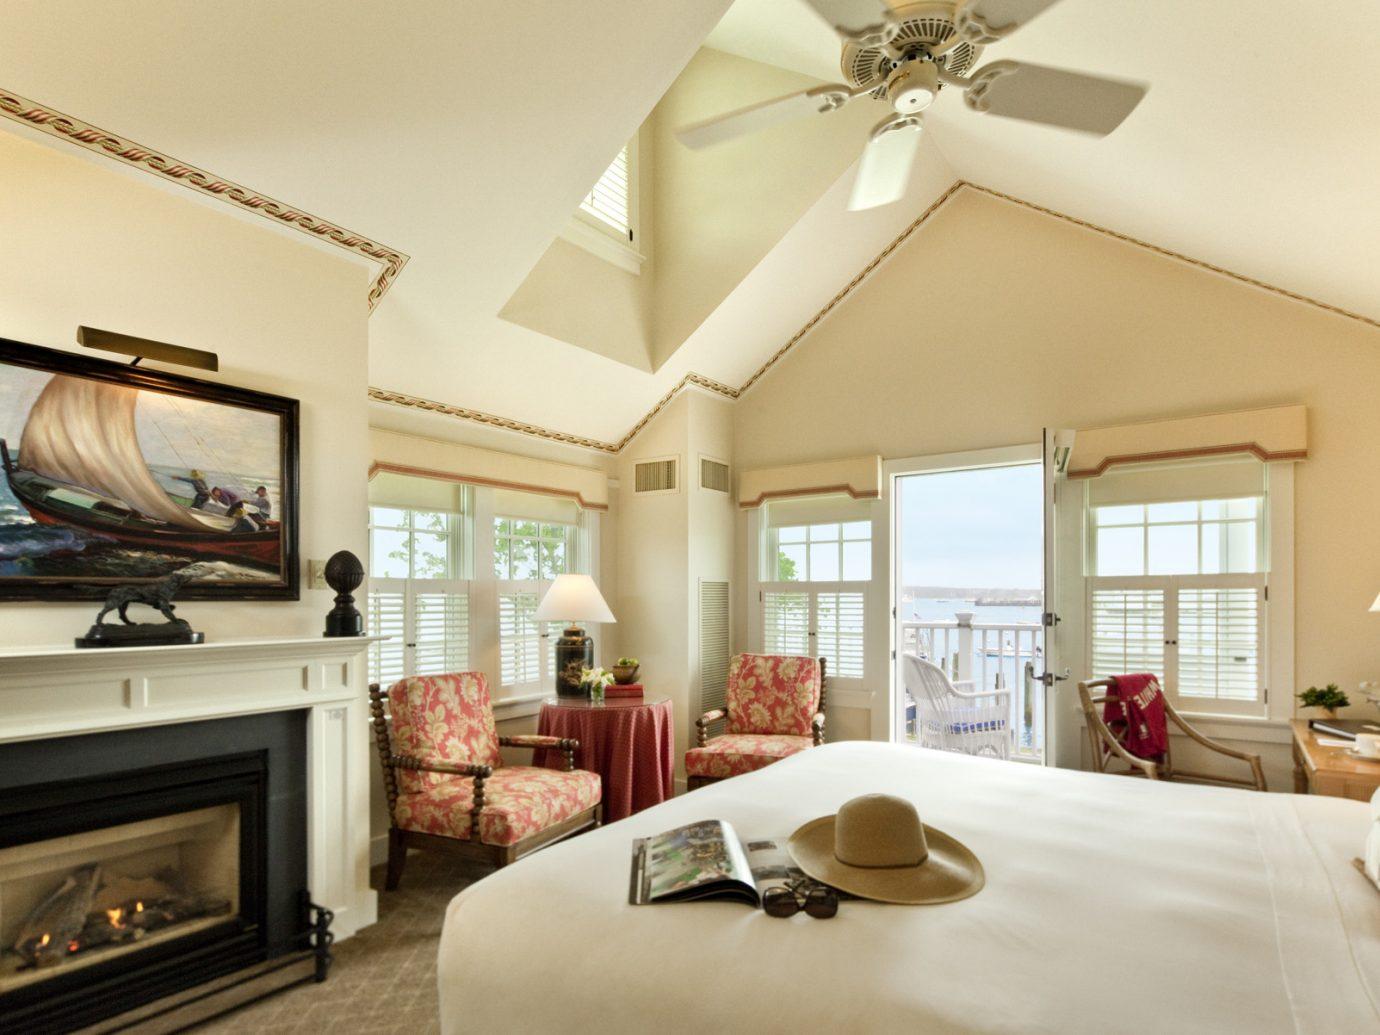 Bedroom at White Elephant Hotel